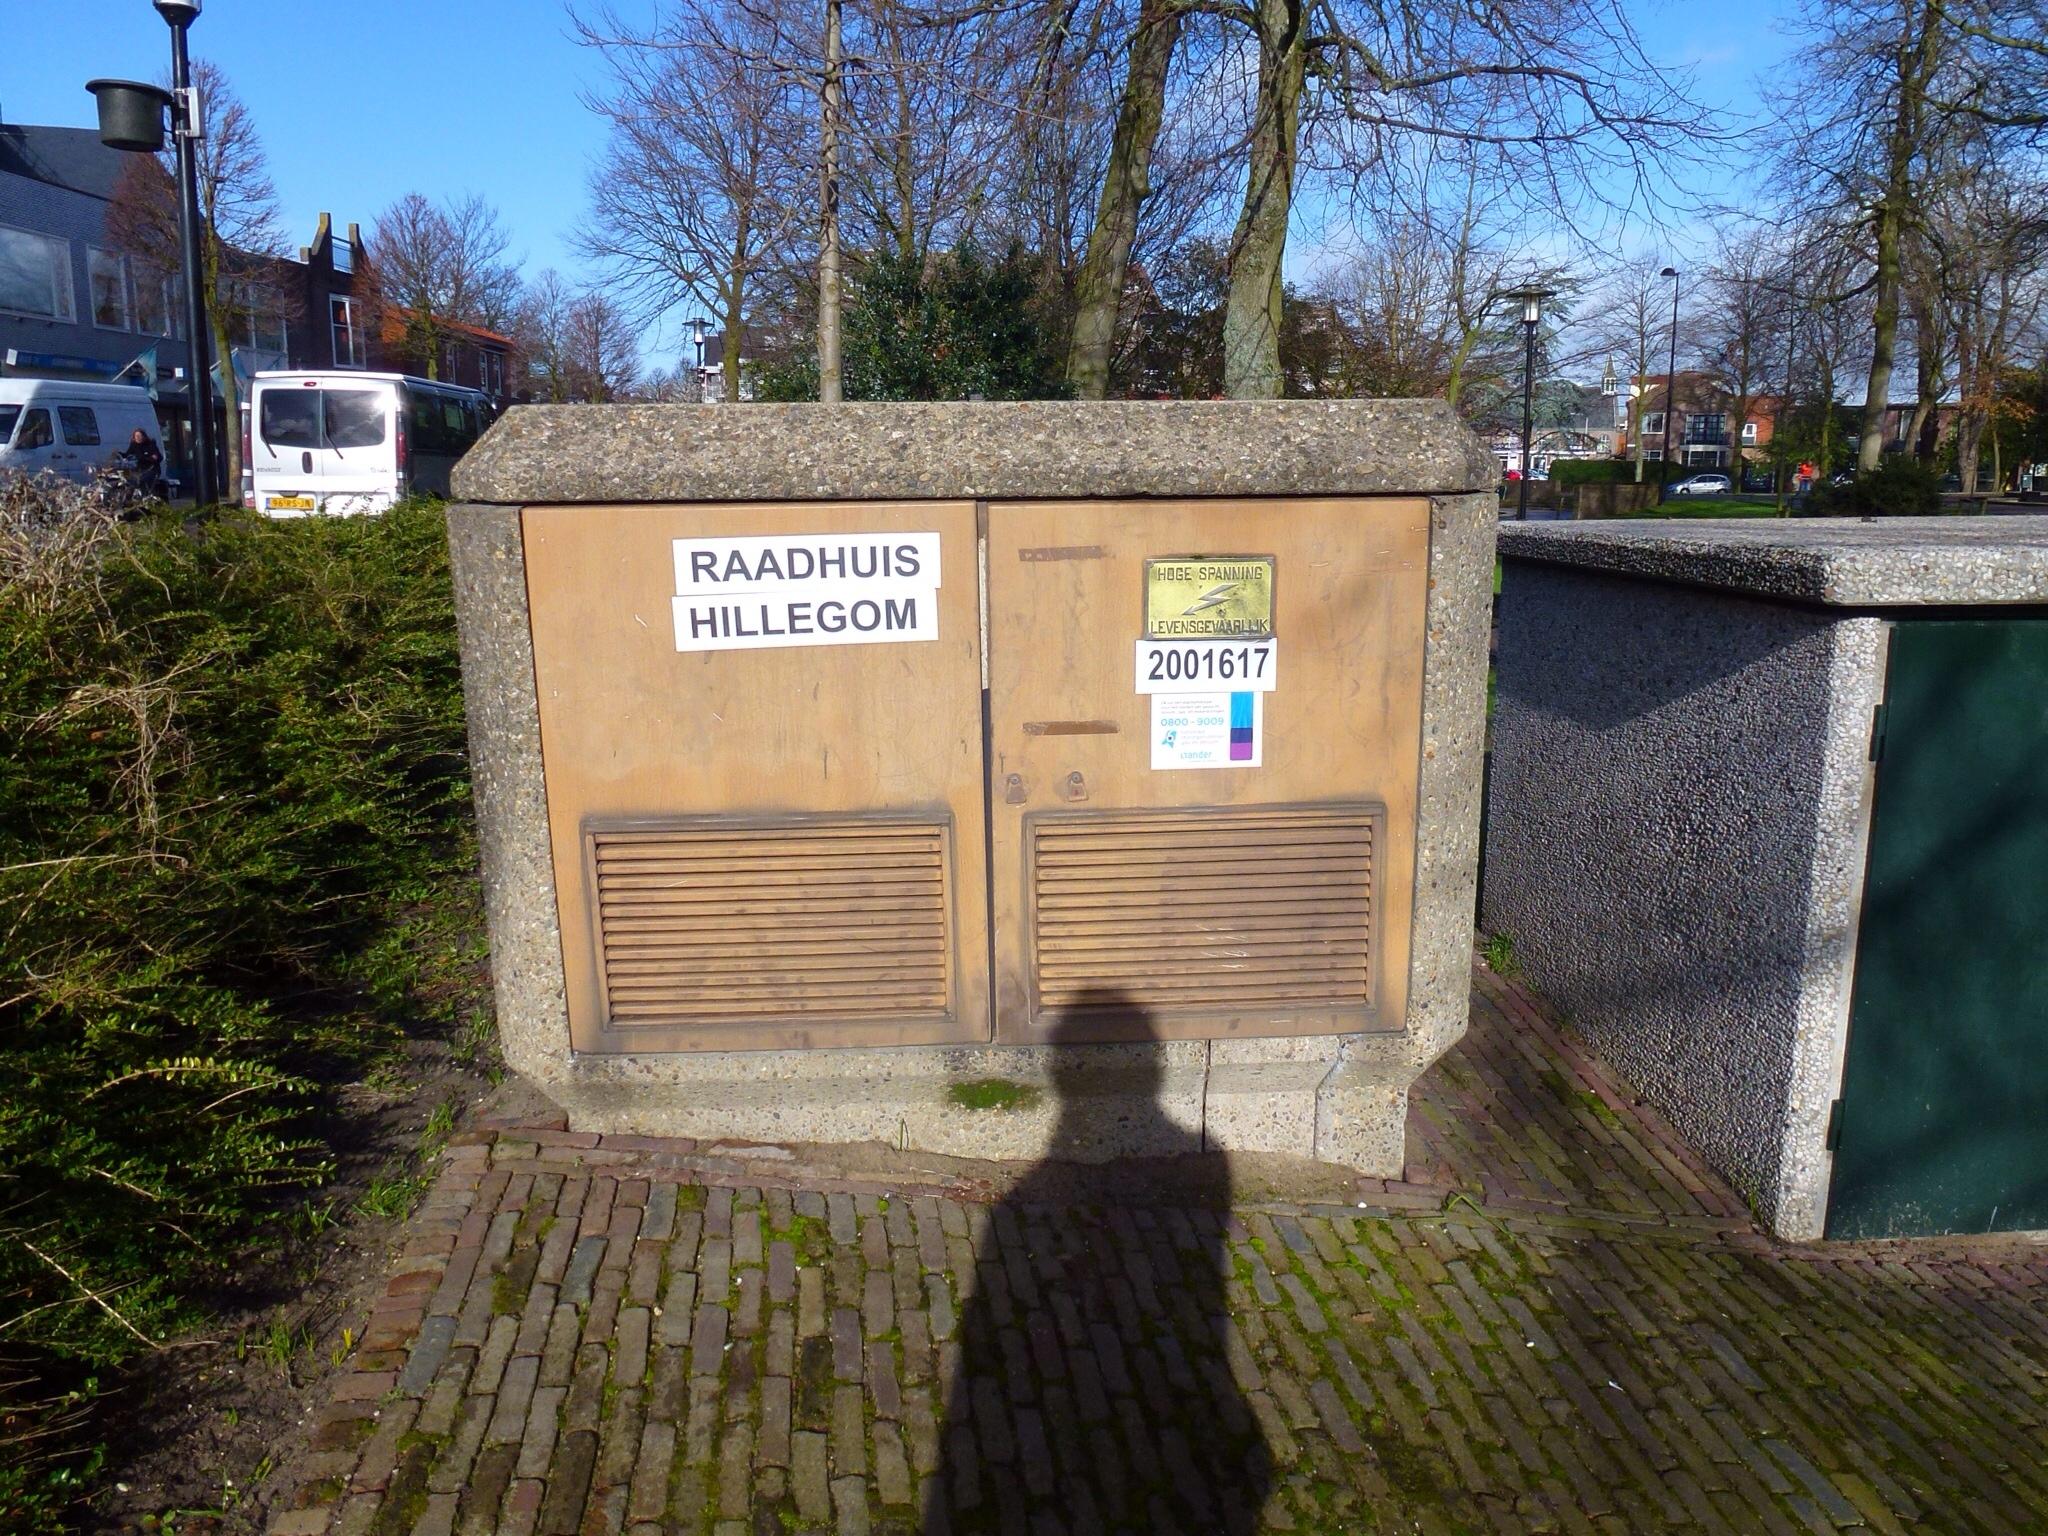 2022: Raadhuis Hillegom